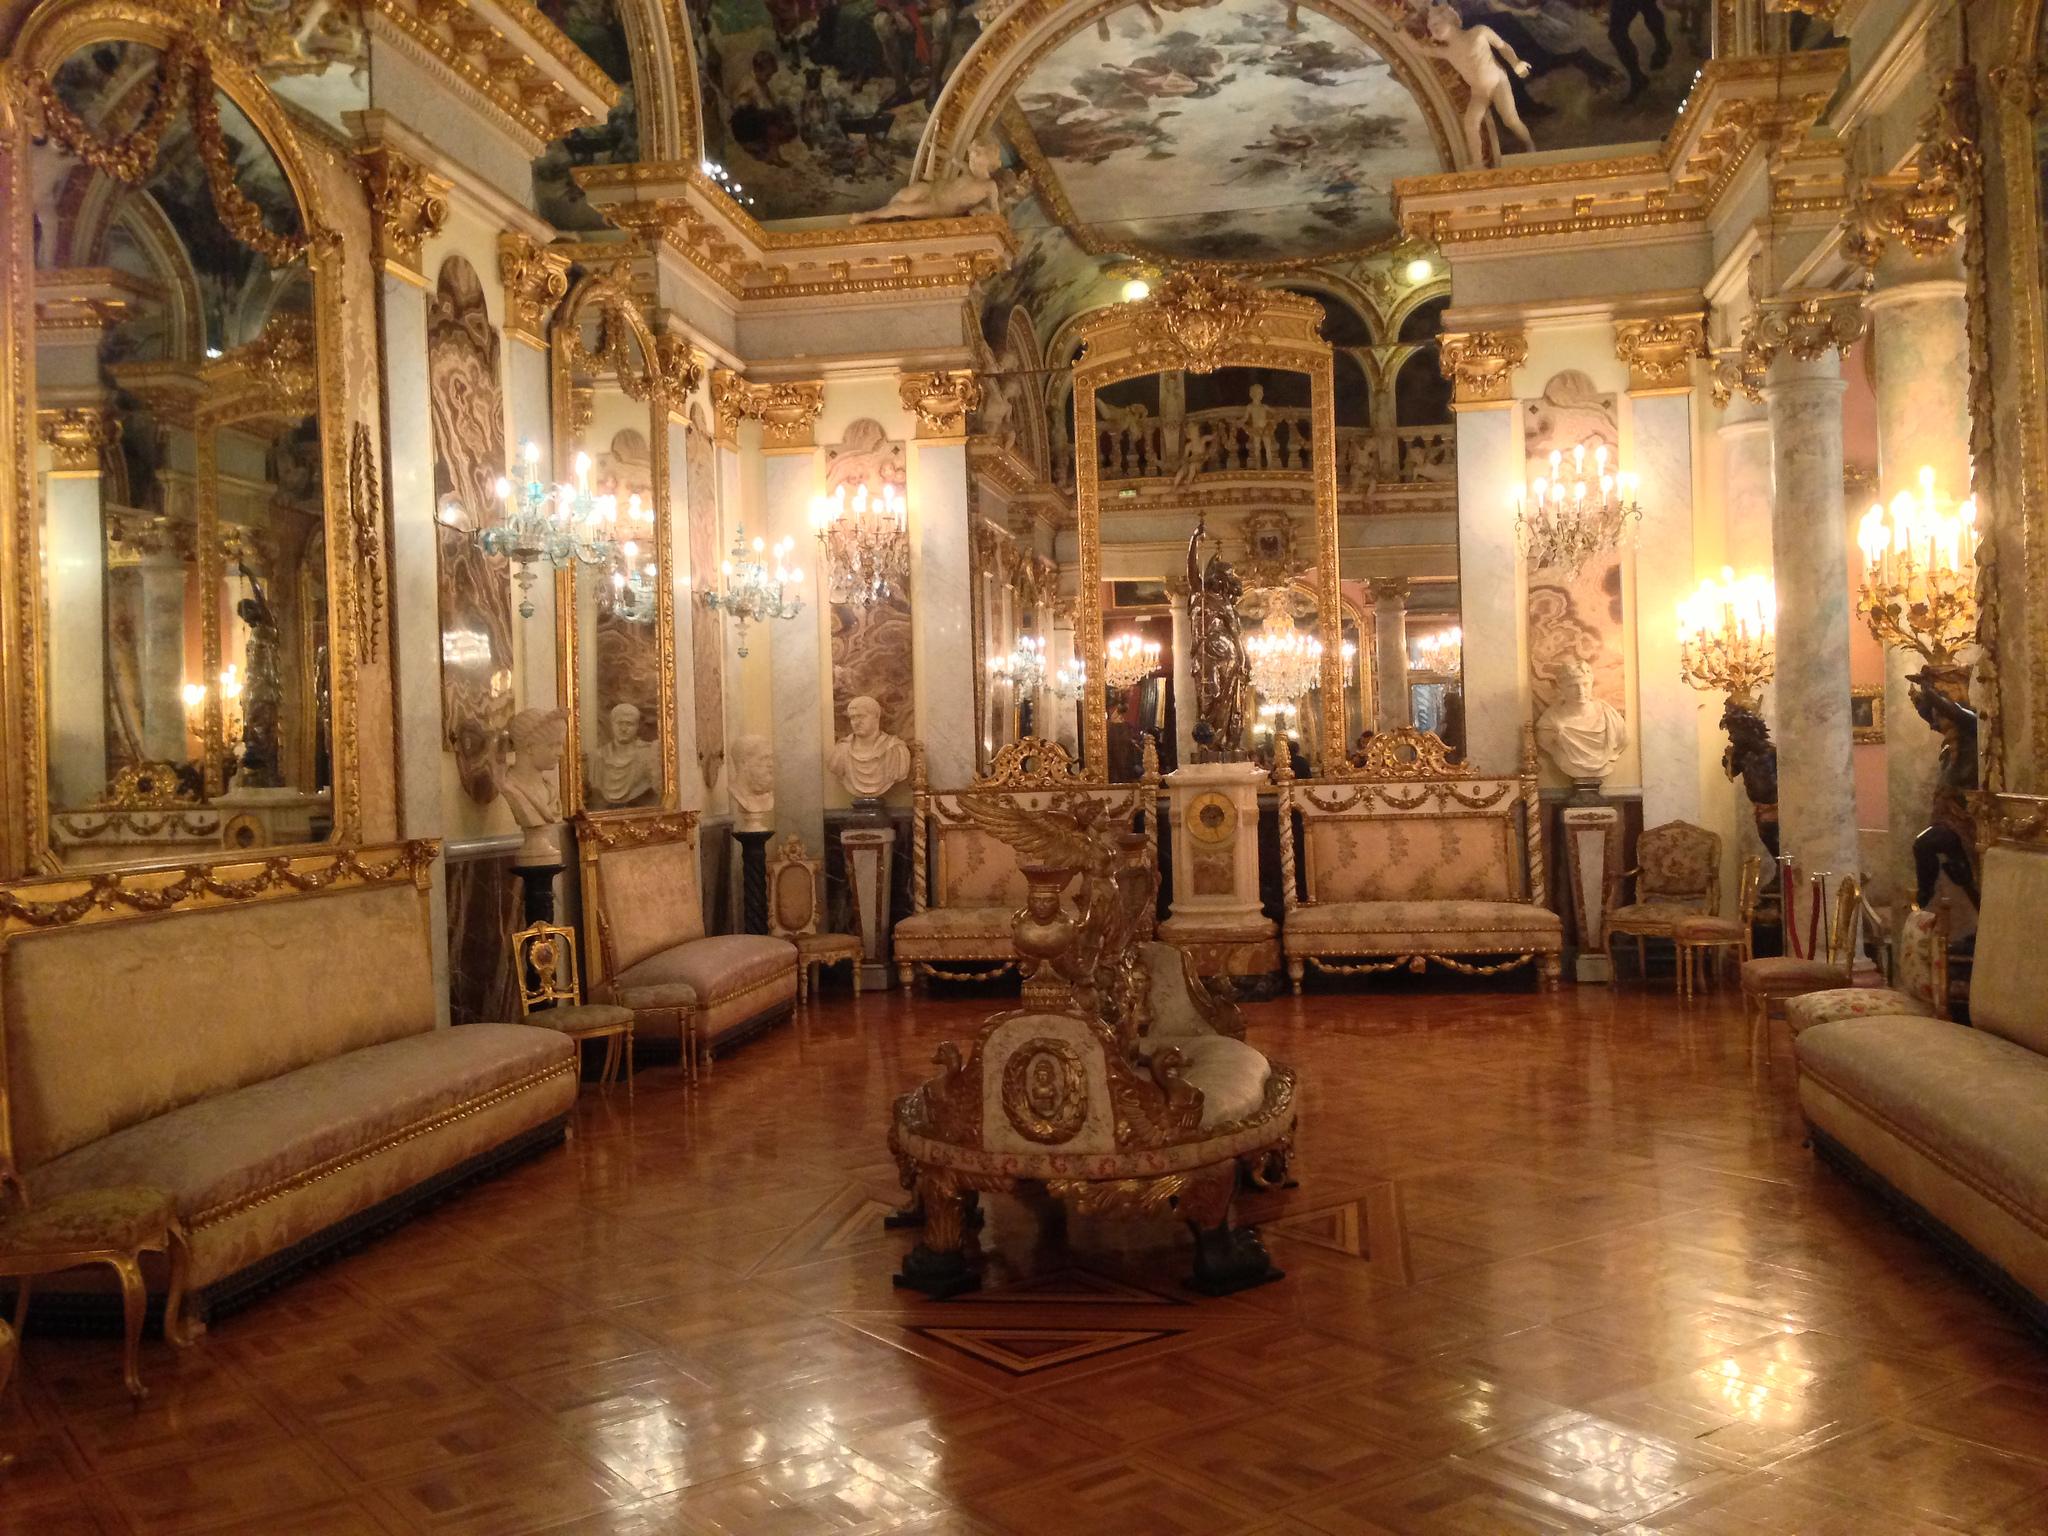 Музей Серральбо в Мадриде, интерьер